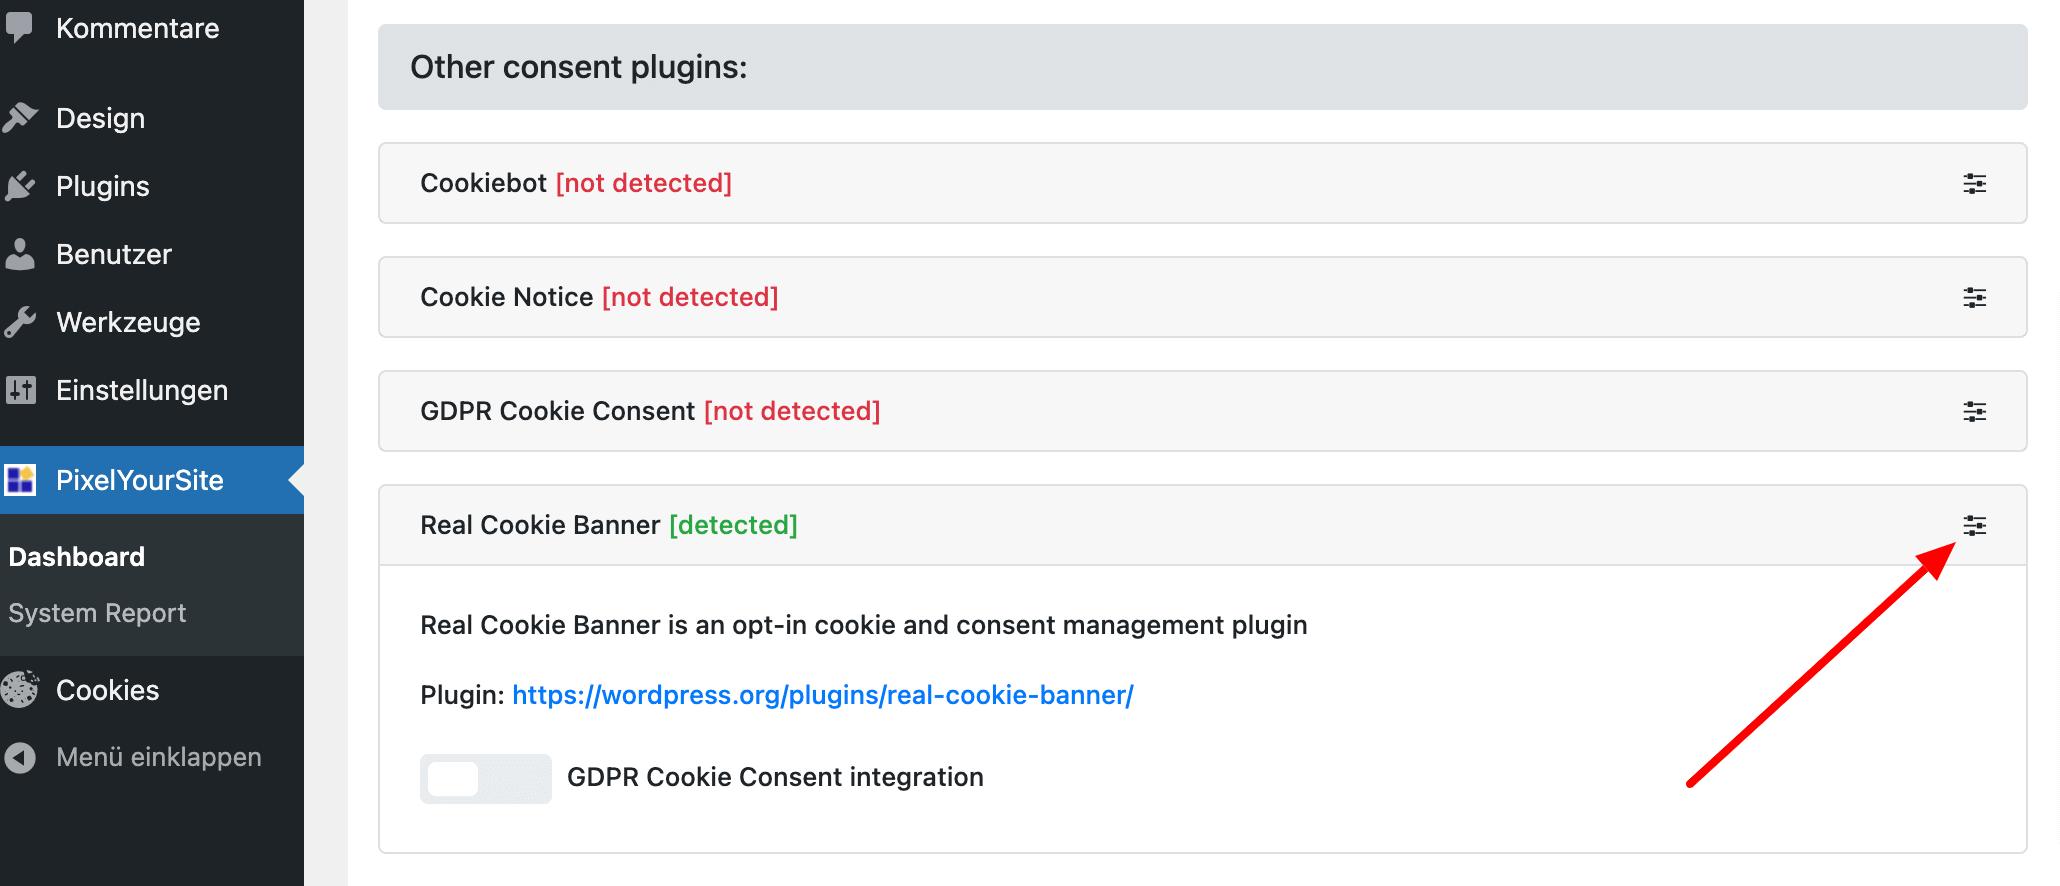 Consent Plugins Integration